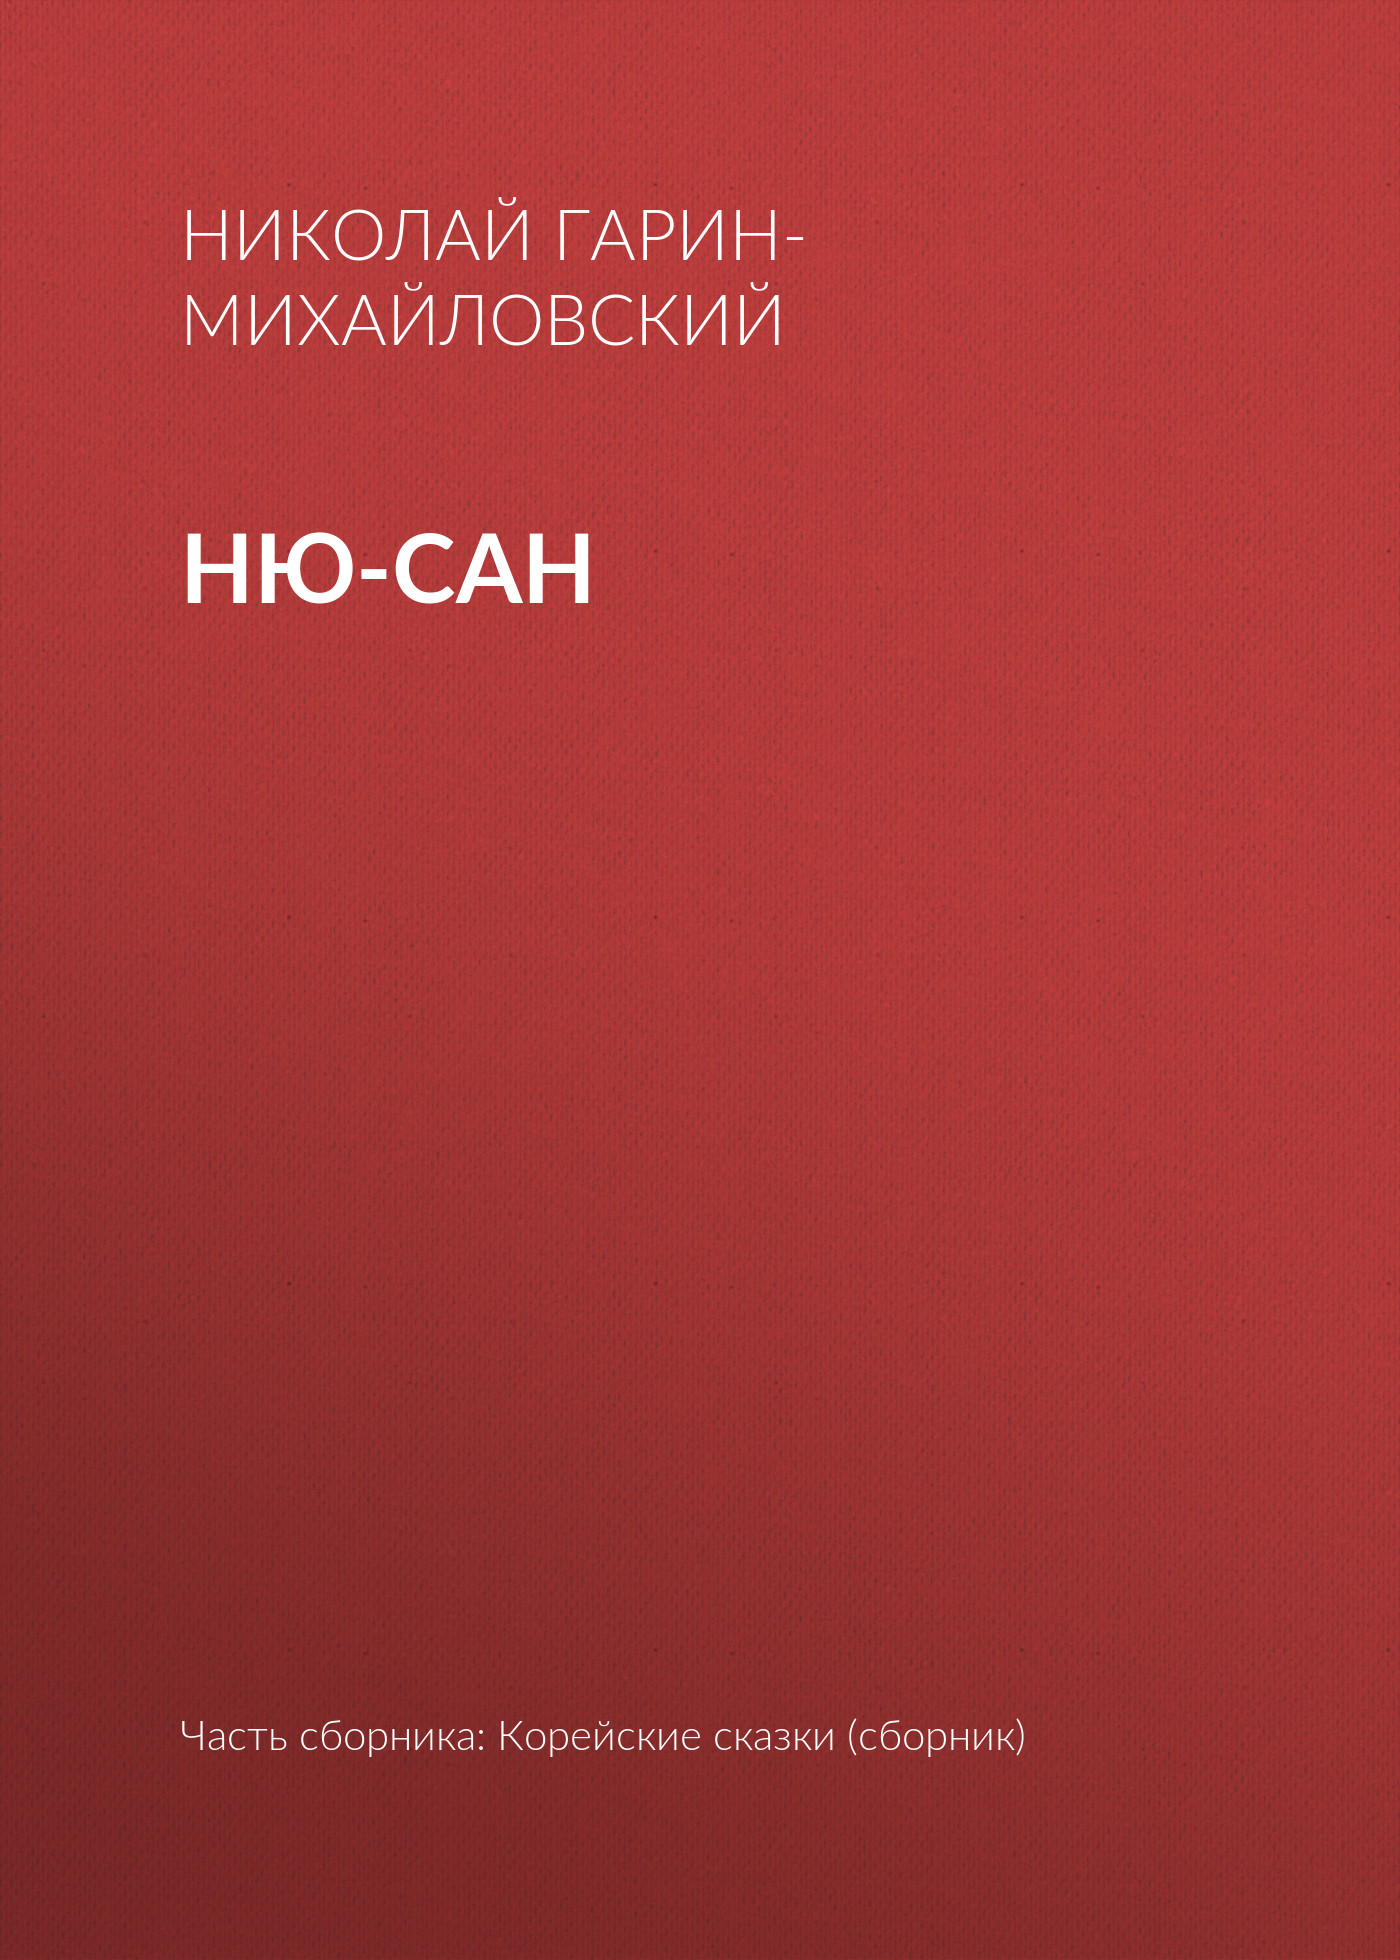 Николай Гарин-Михайловский Ню-сан николай гарин михайловский памяти чехова